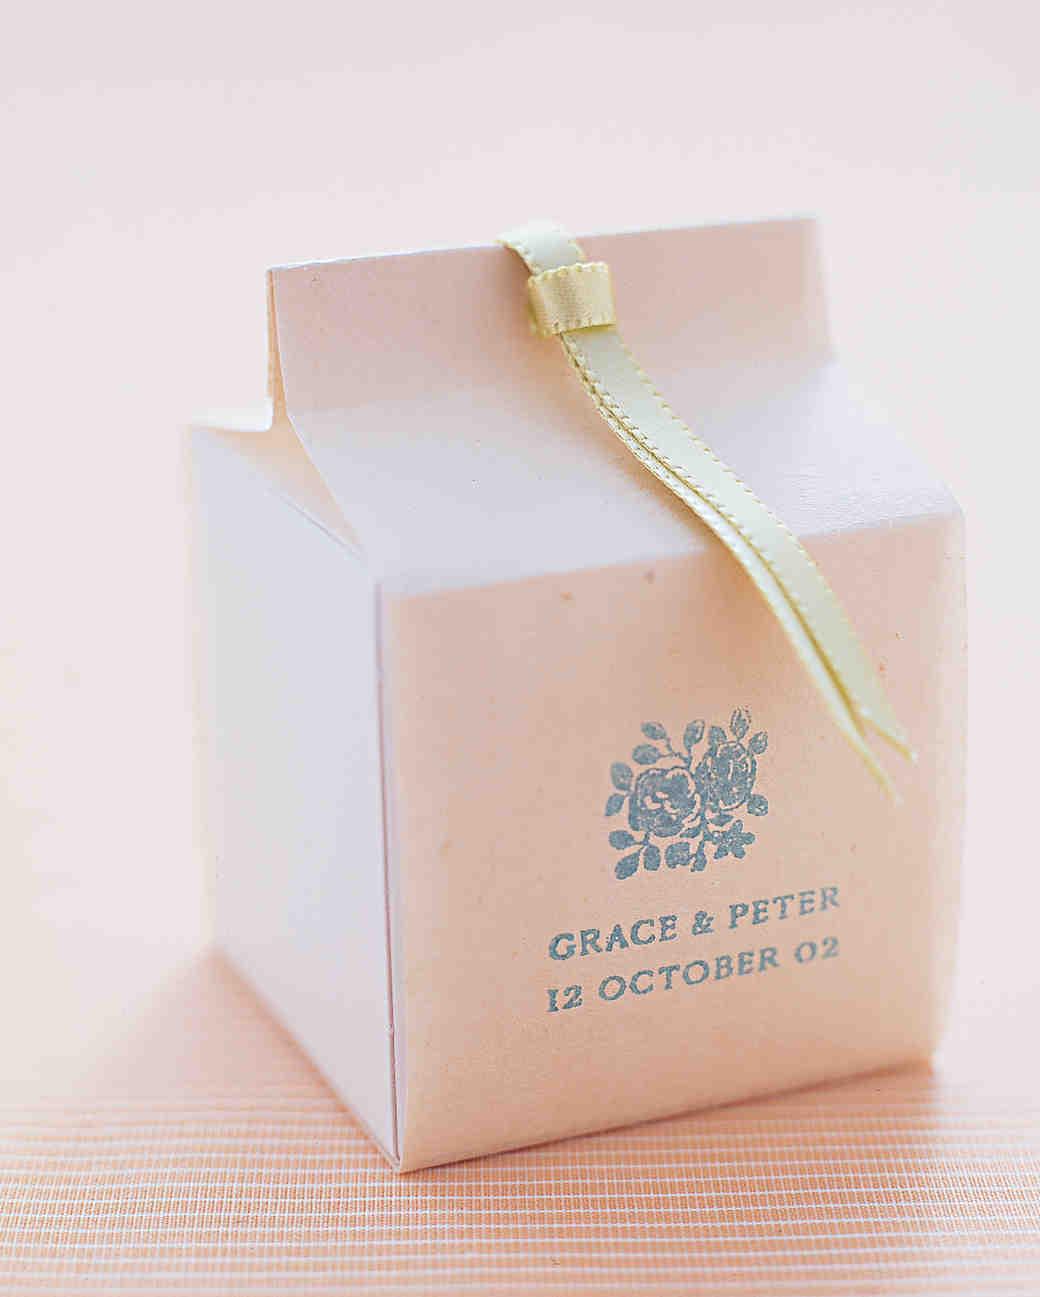 wedding gift bo for cards martha stewart gift ideas